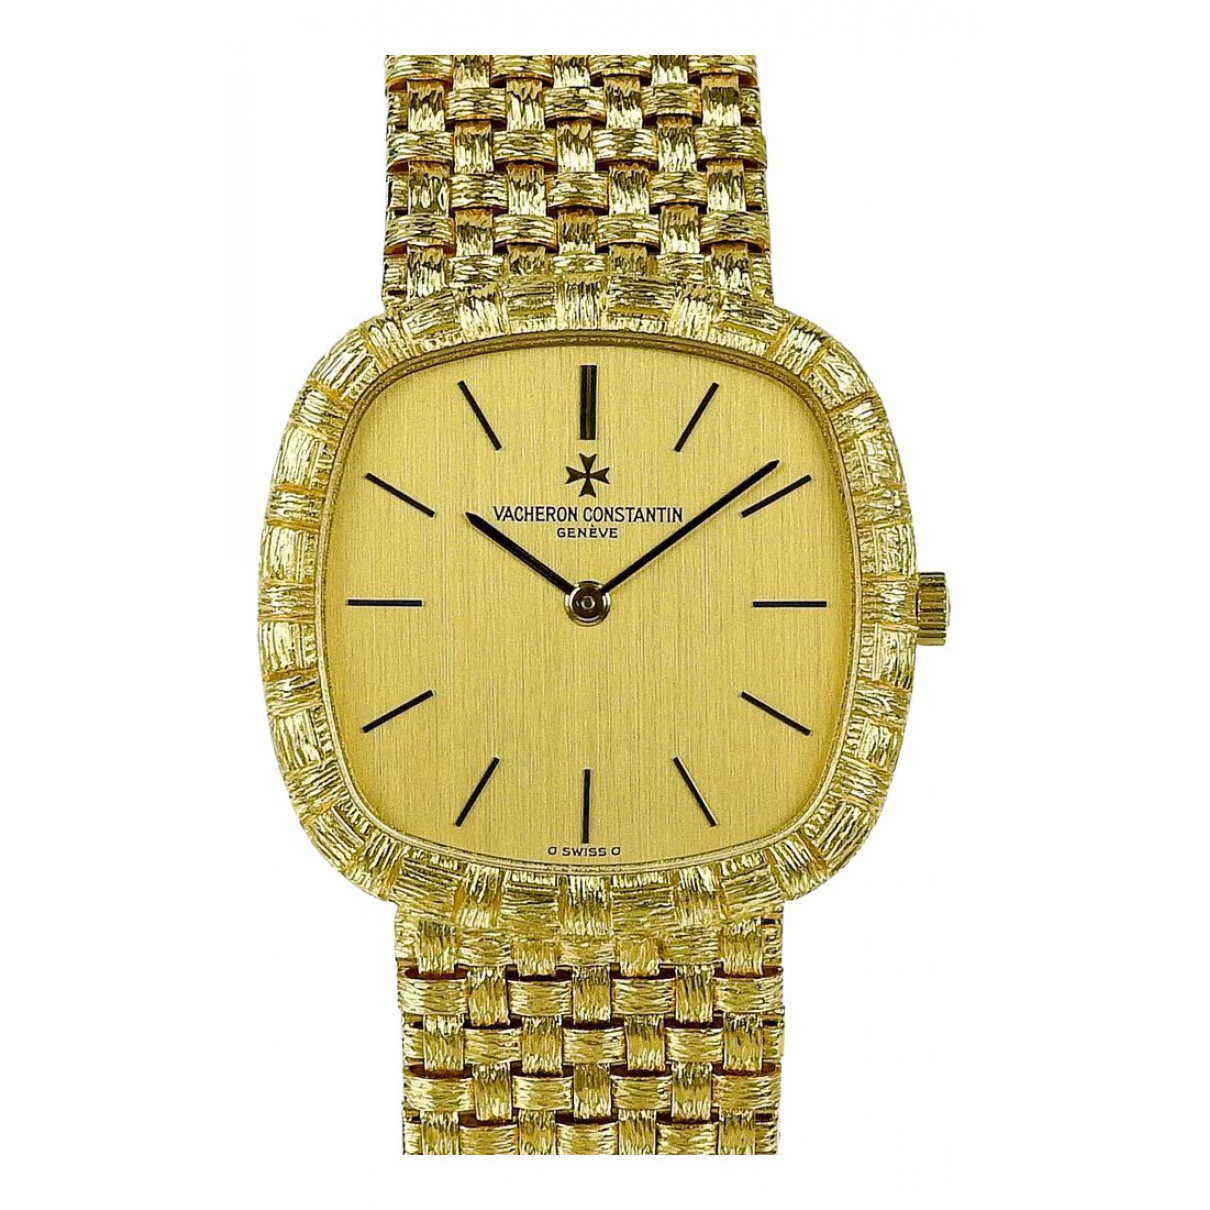 Vacheron Constantin \N Yellow Yellow gold watch for Men \N